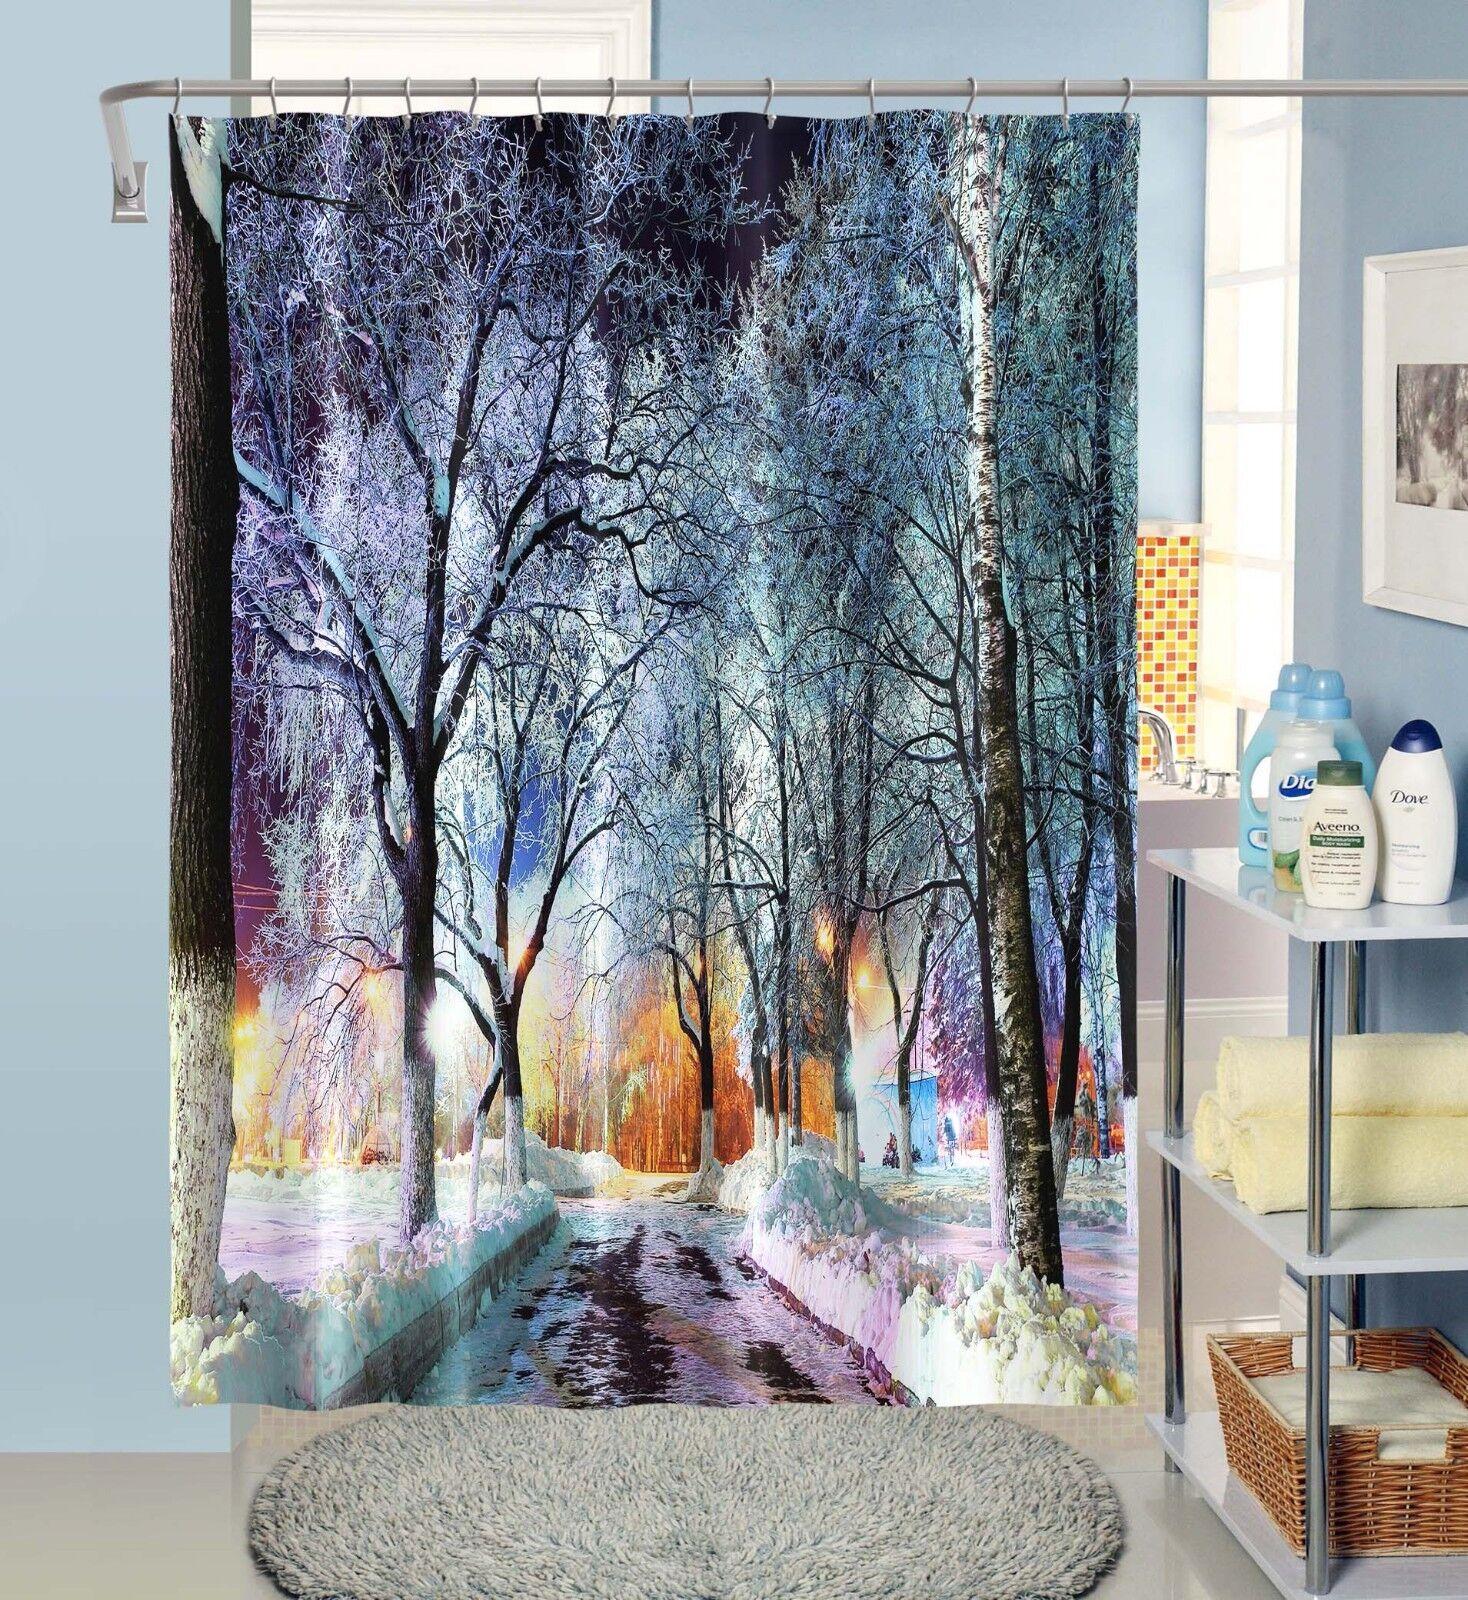 3D Night Snow 12 12 12 Shower Curtain Waterproof Fiber Bathroom Home Windows Toilet b668aa